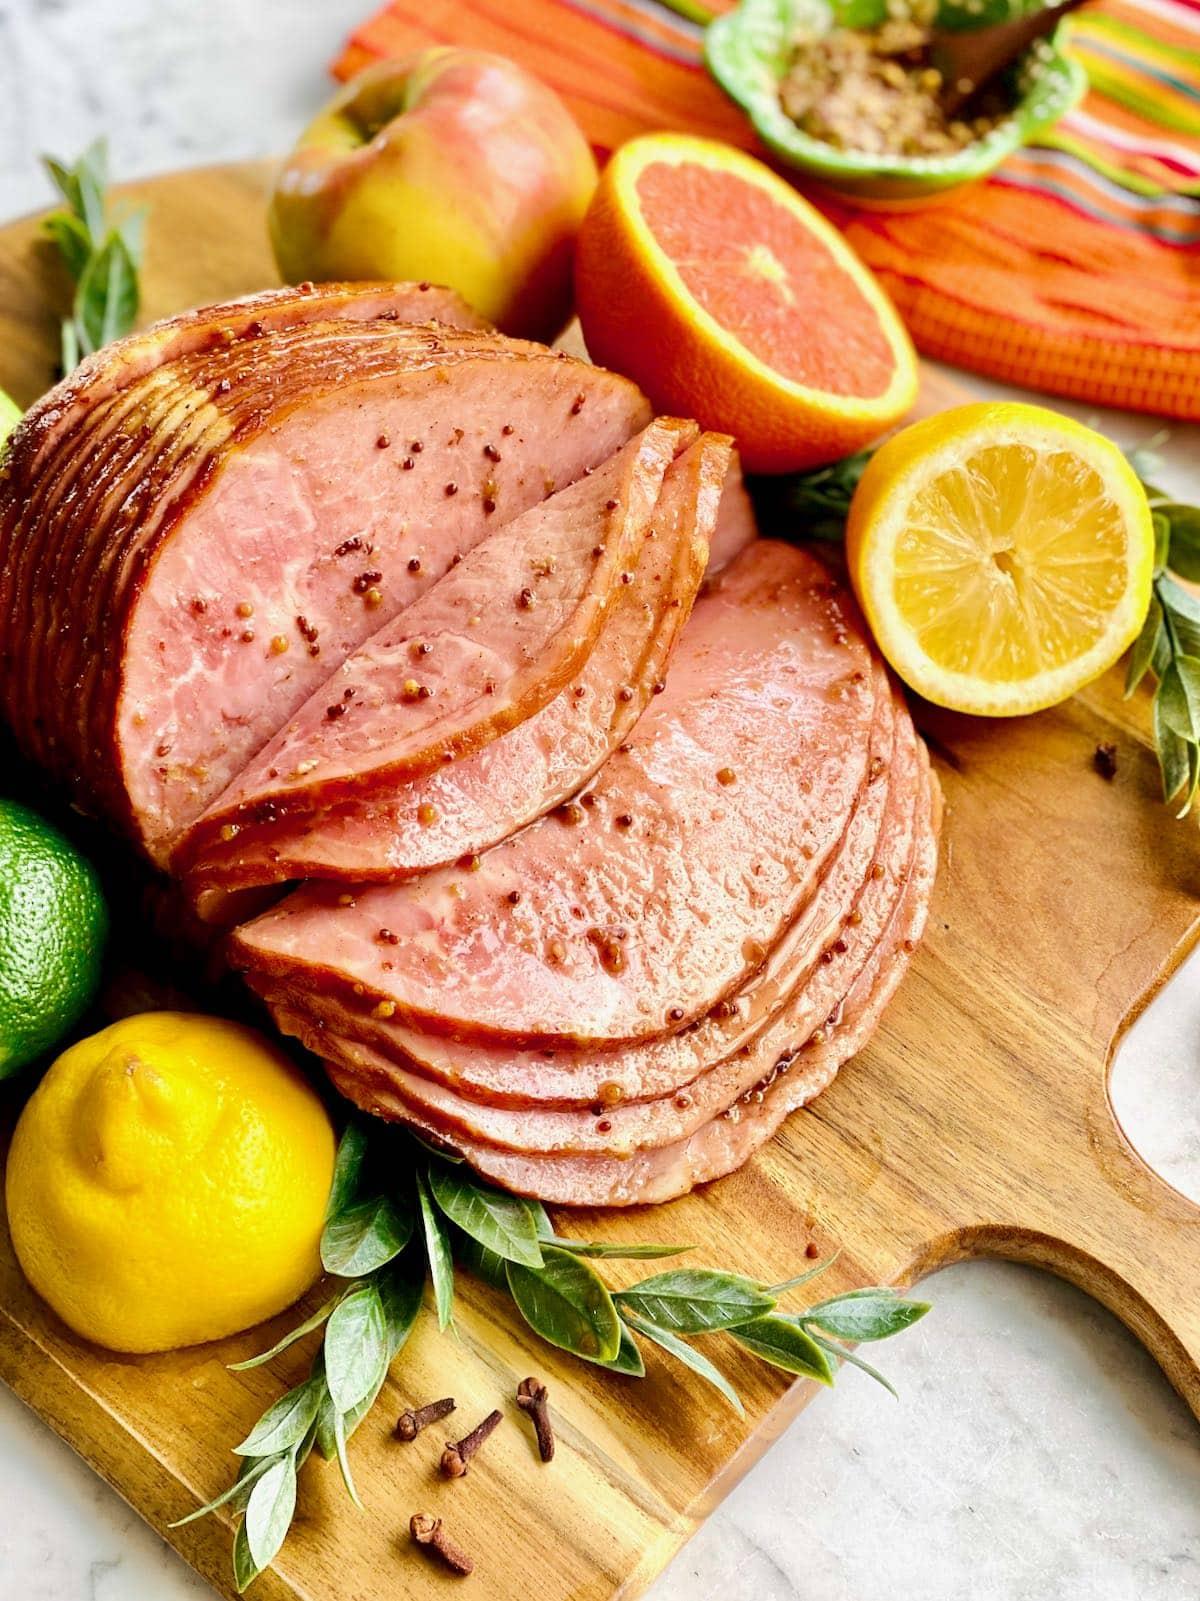 spiral ham sliced on a wooden board.